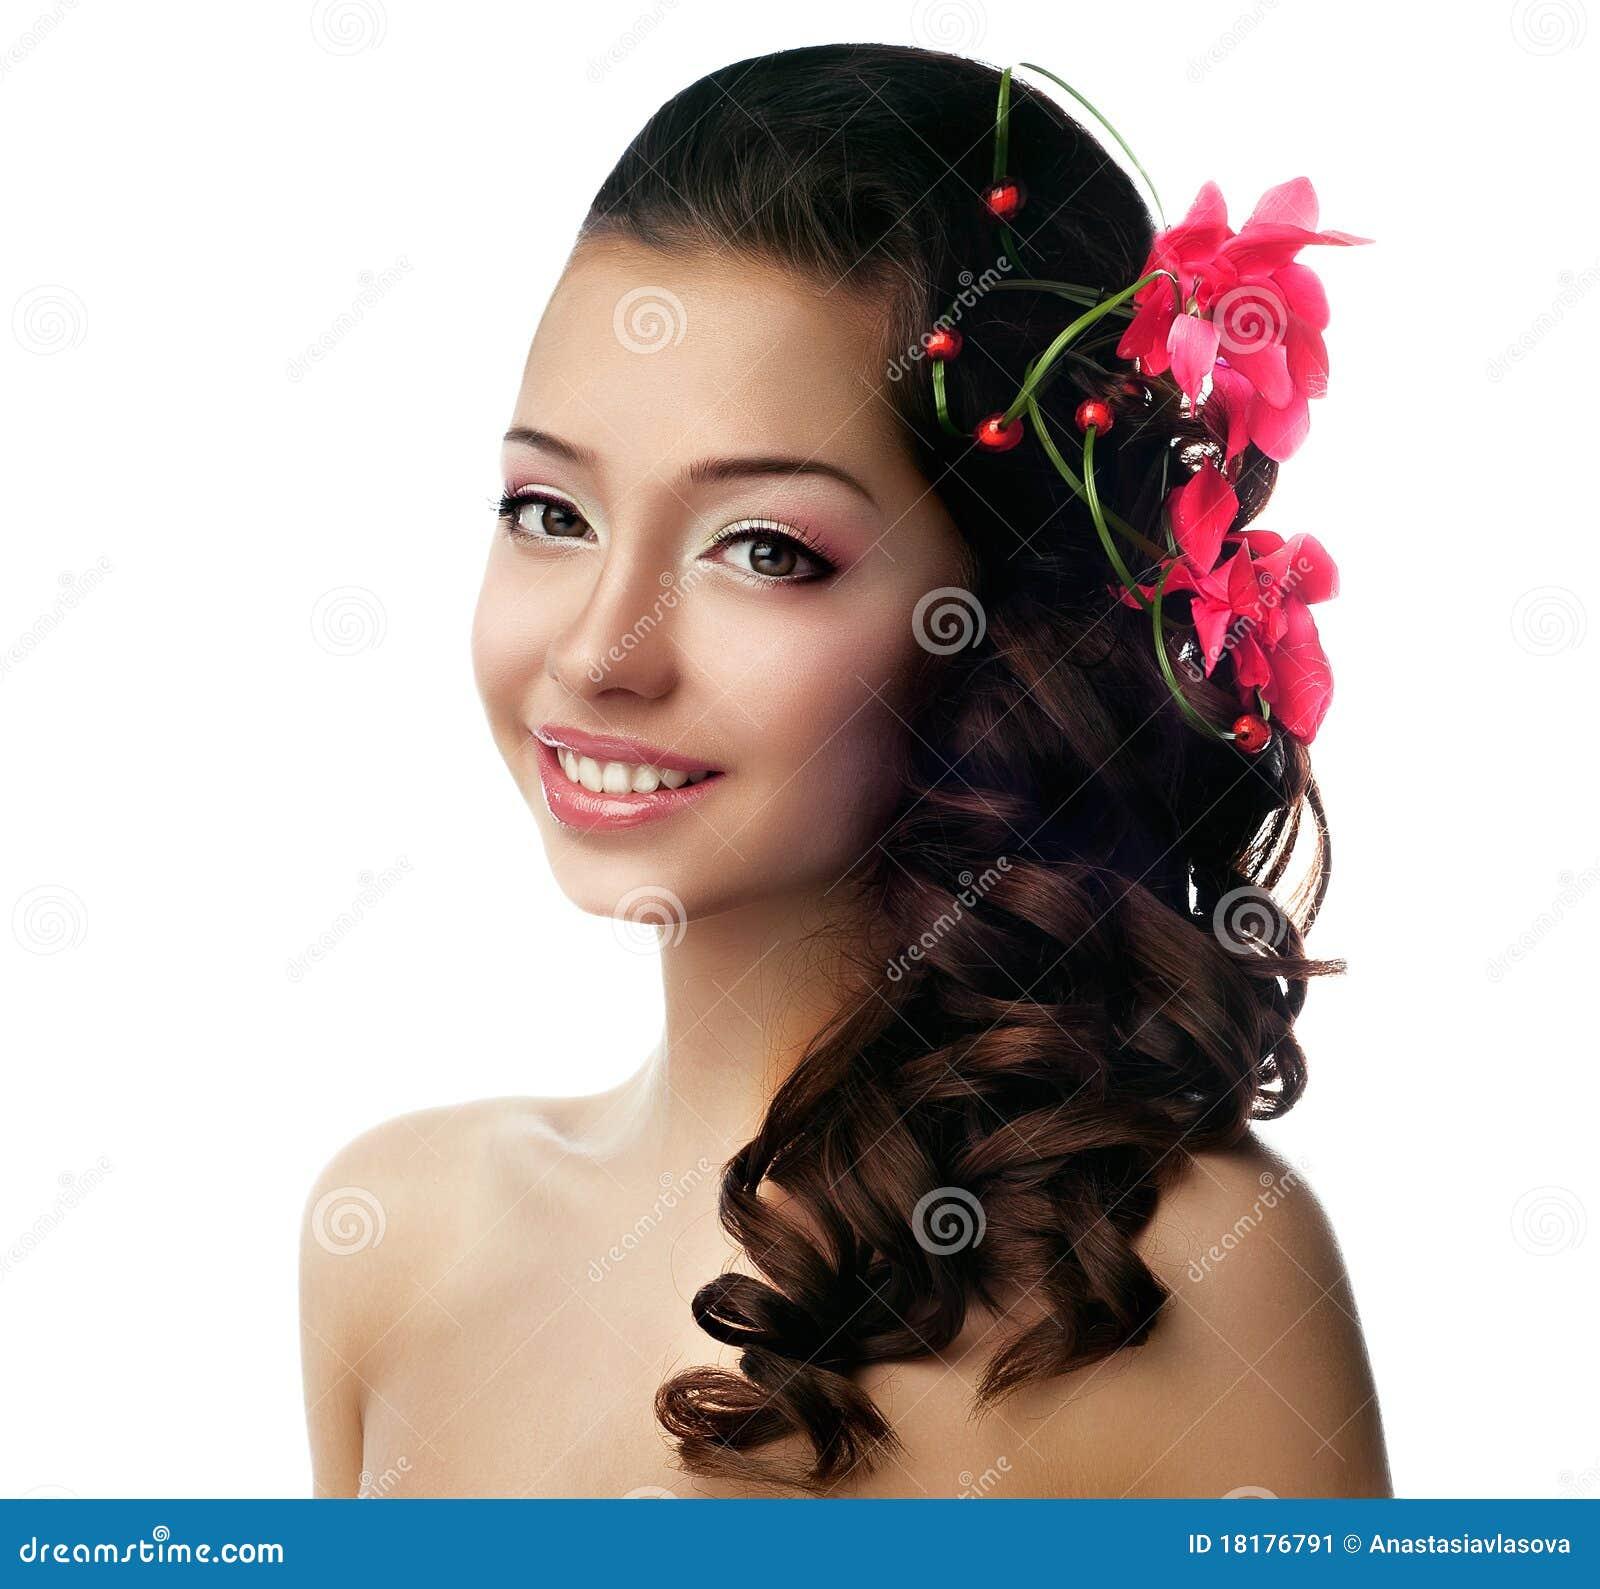 flower in her hair - photo #15